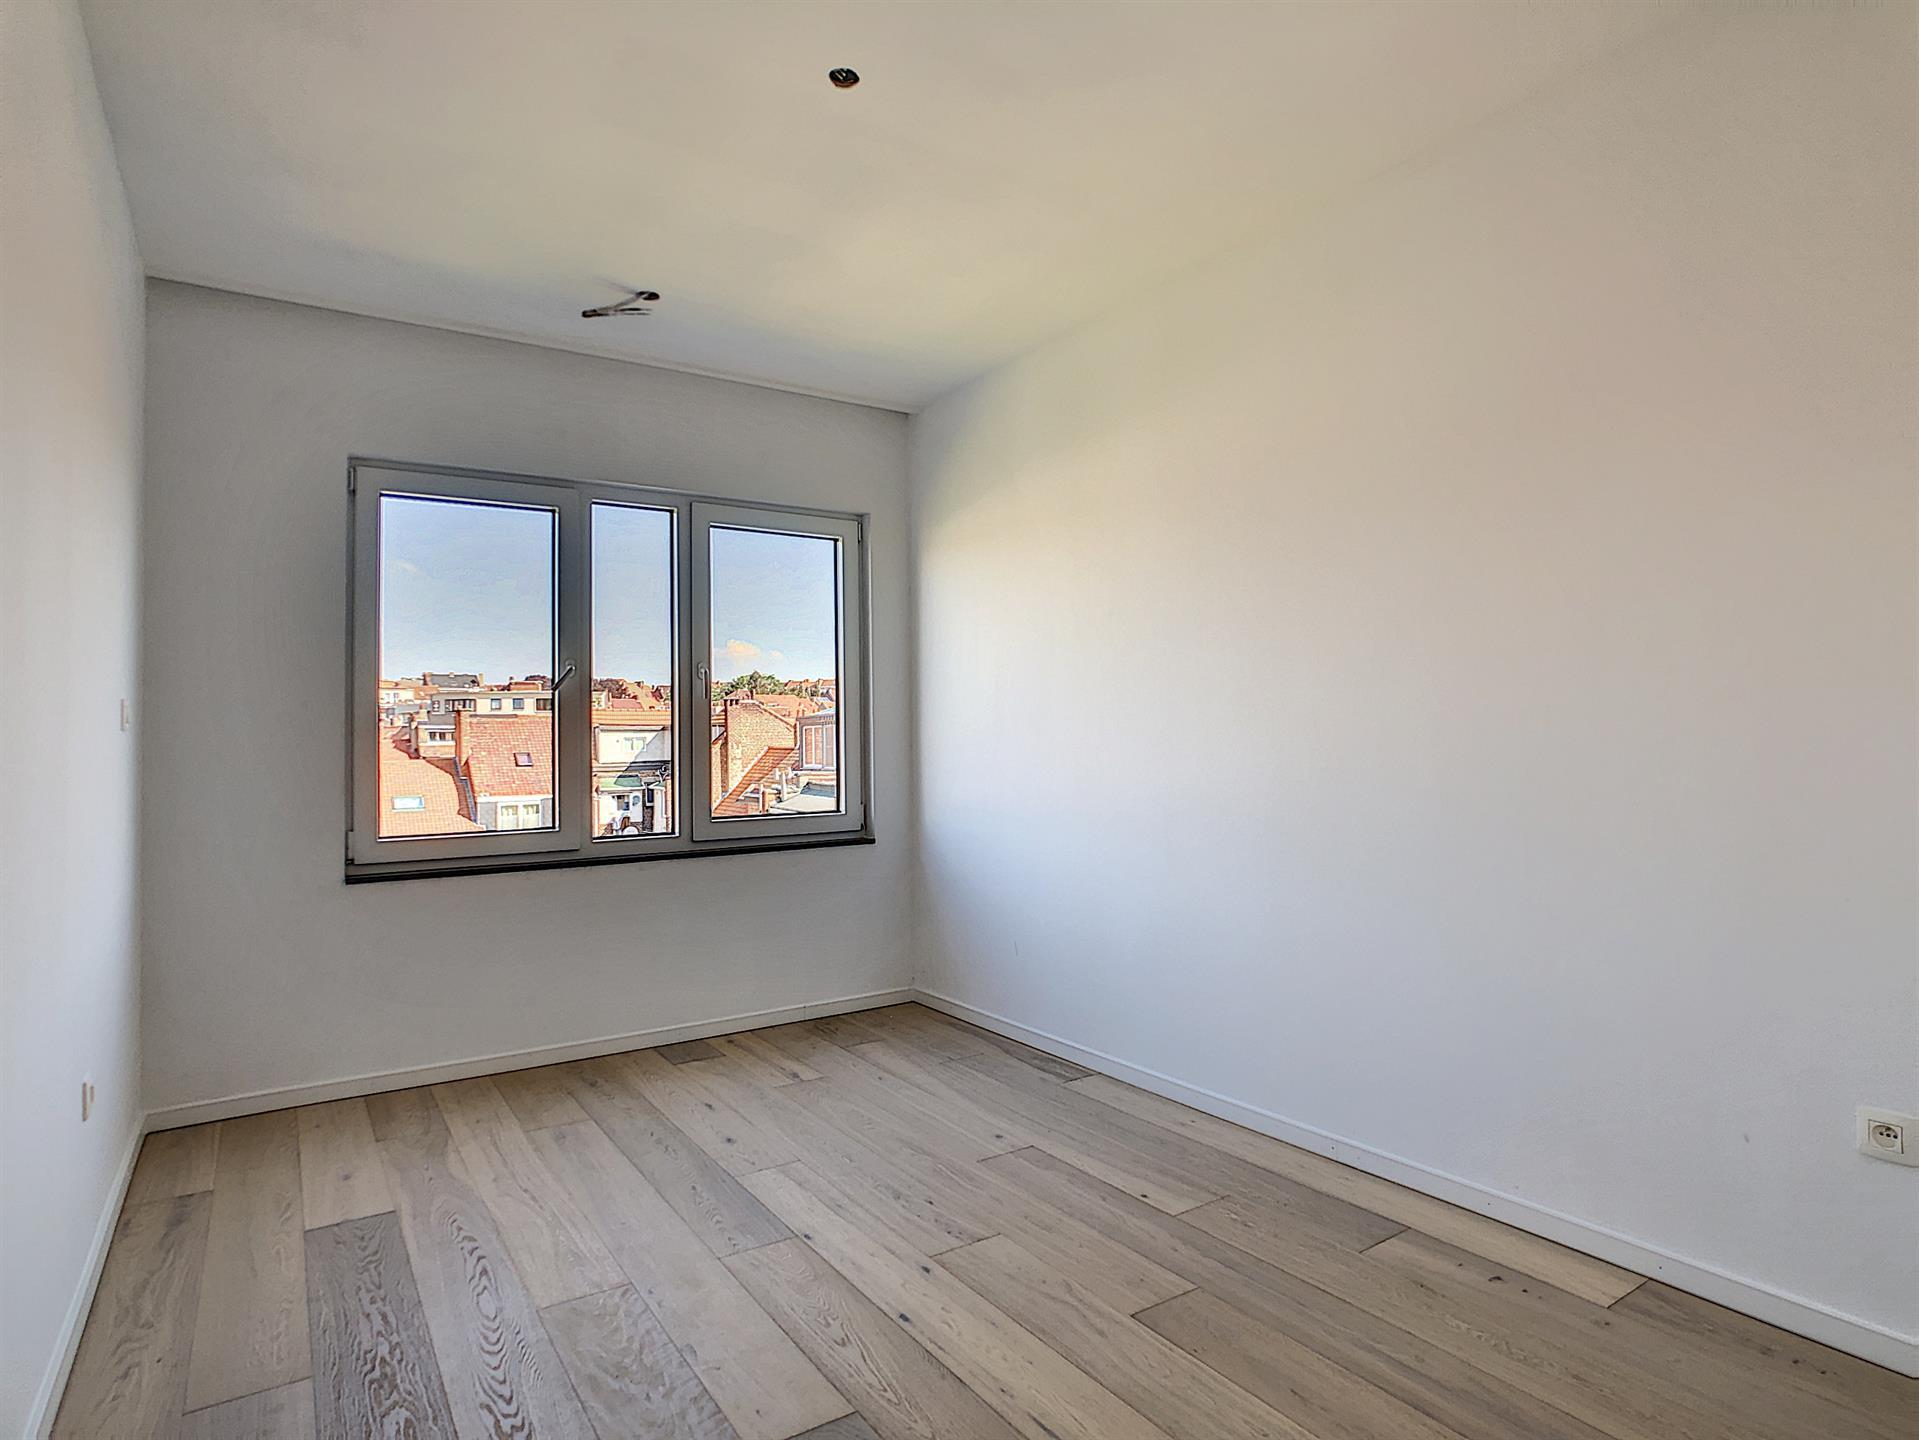 Appartement - Anderlecht - #4252388-20